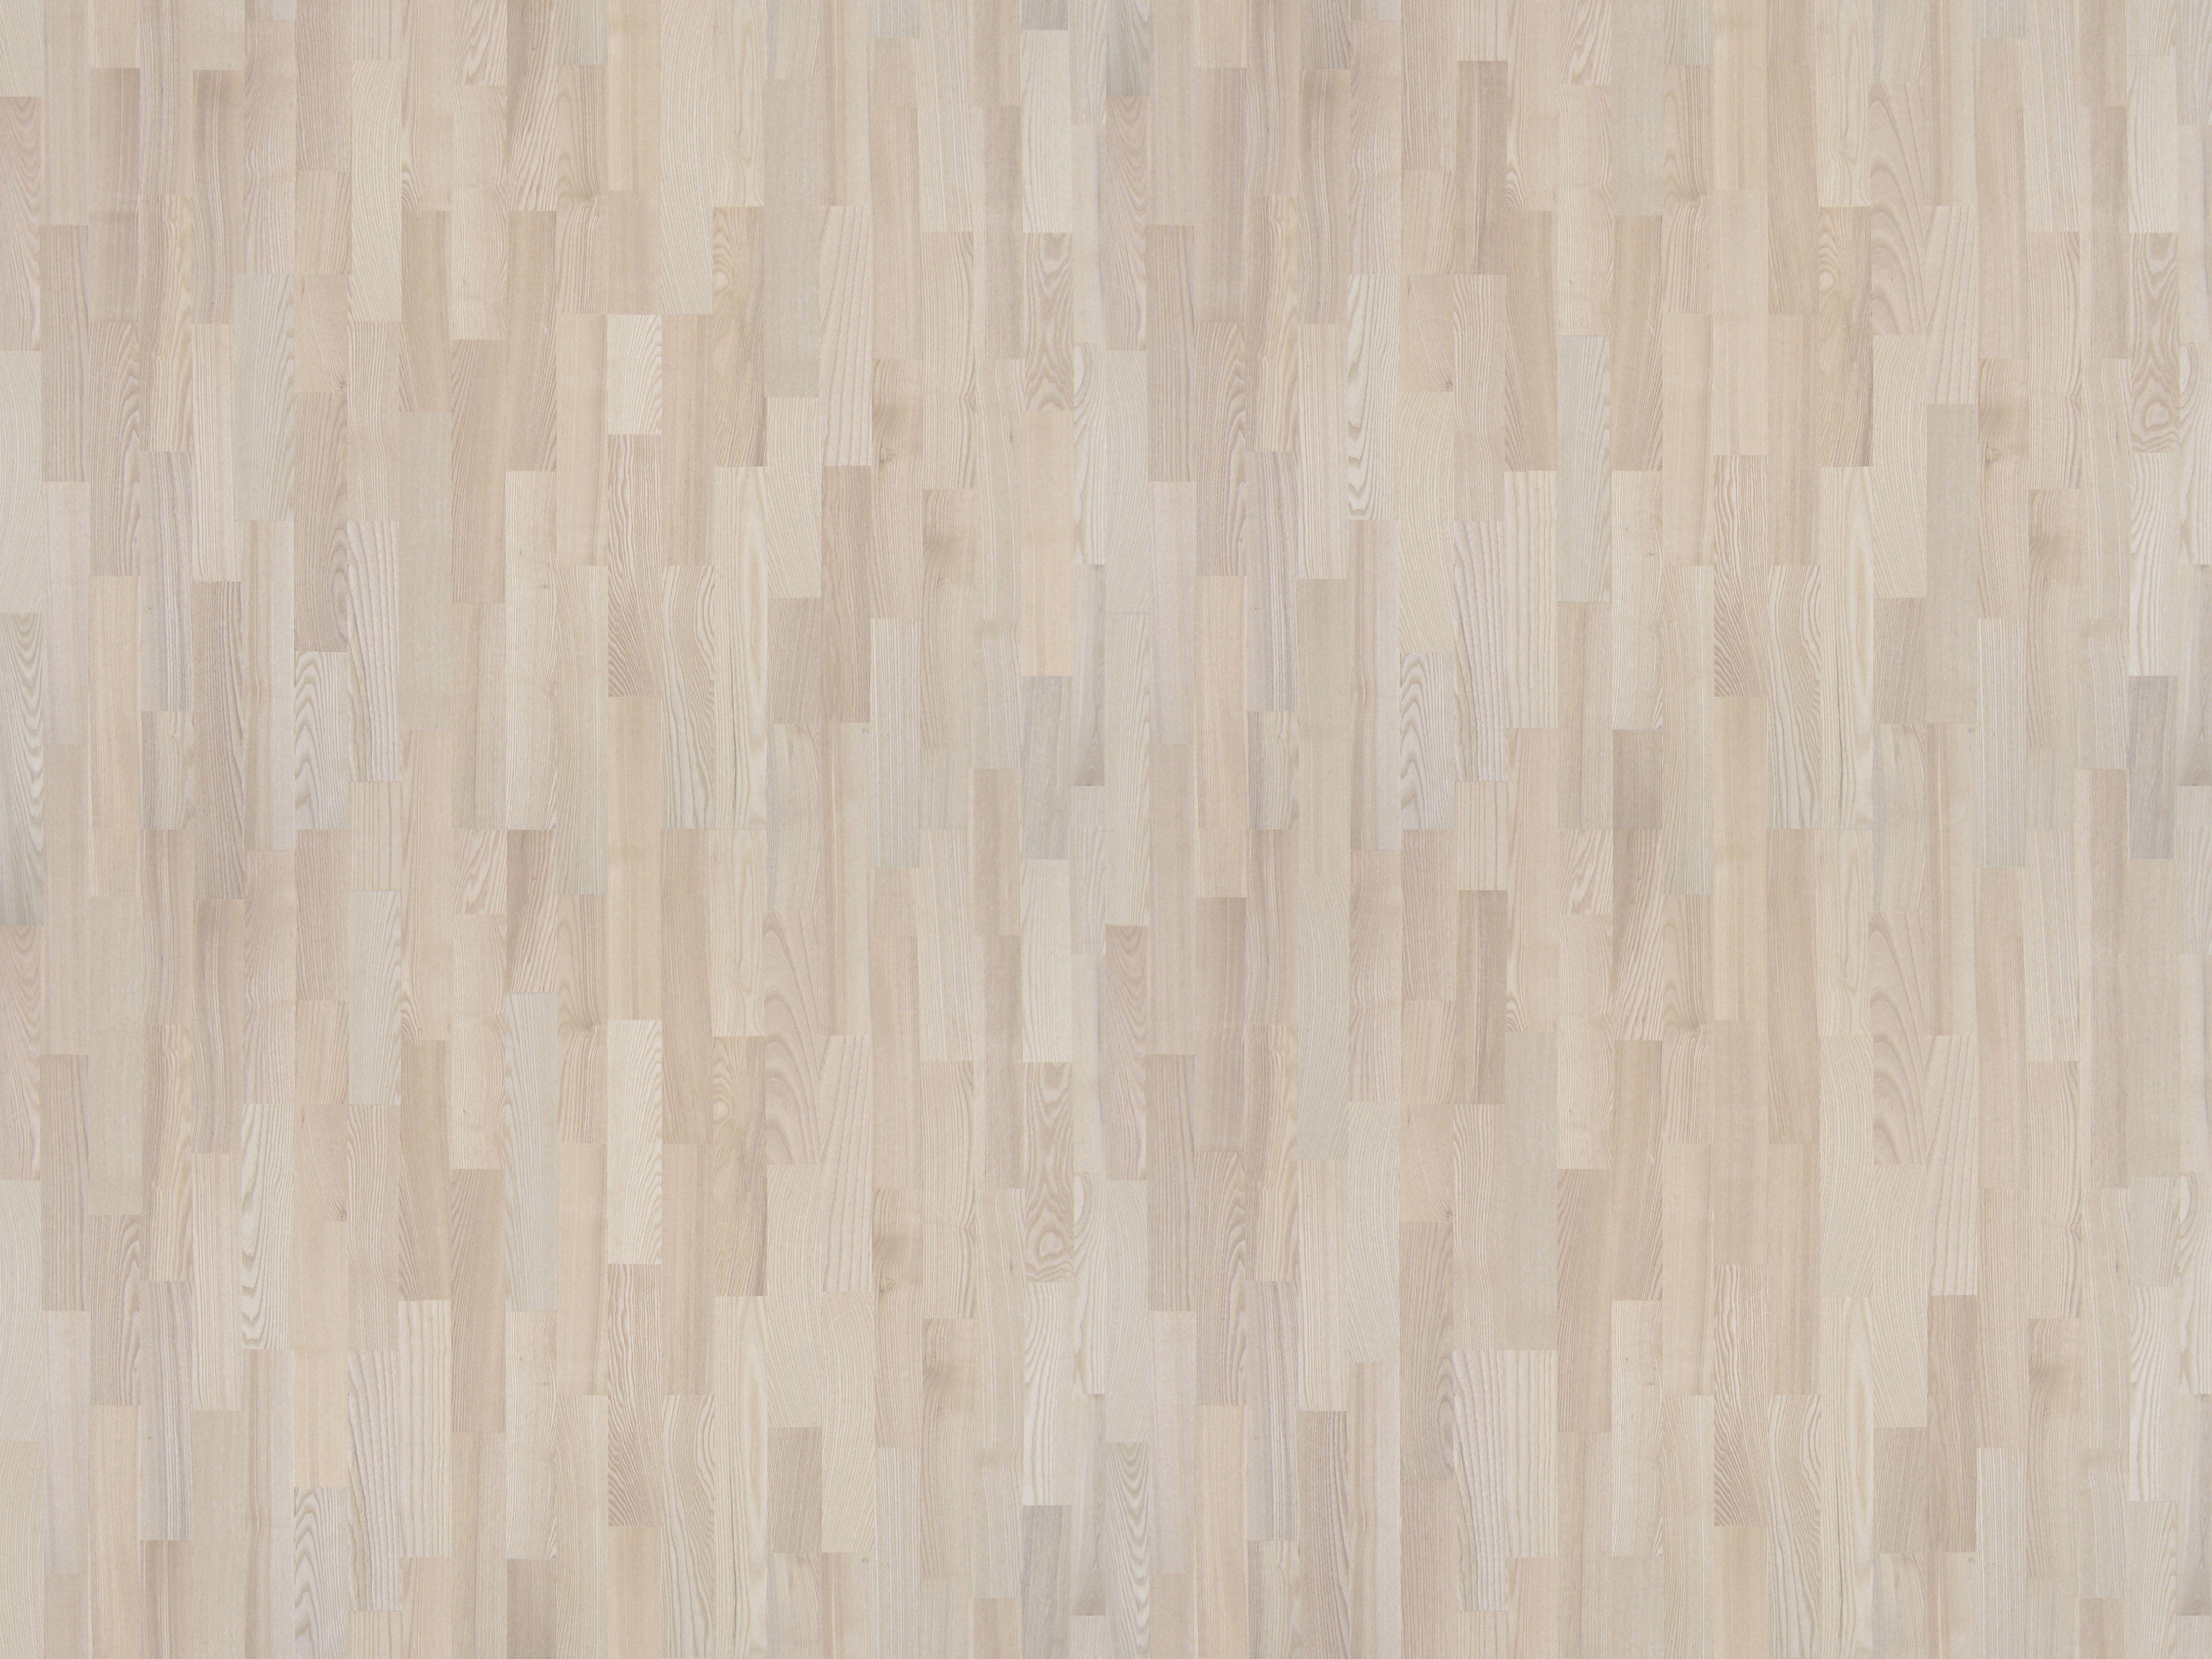 Light Wood Floor Texture Seamless Design Inspiration